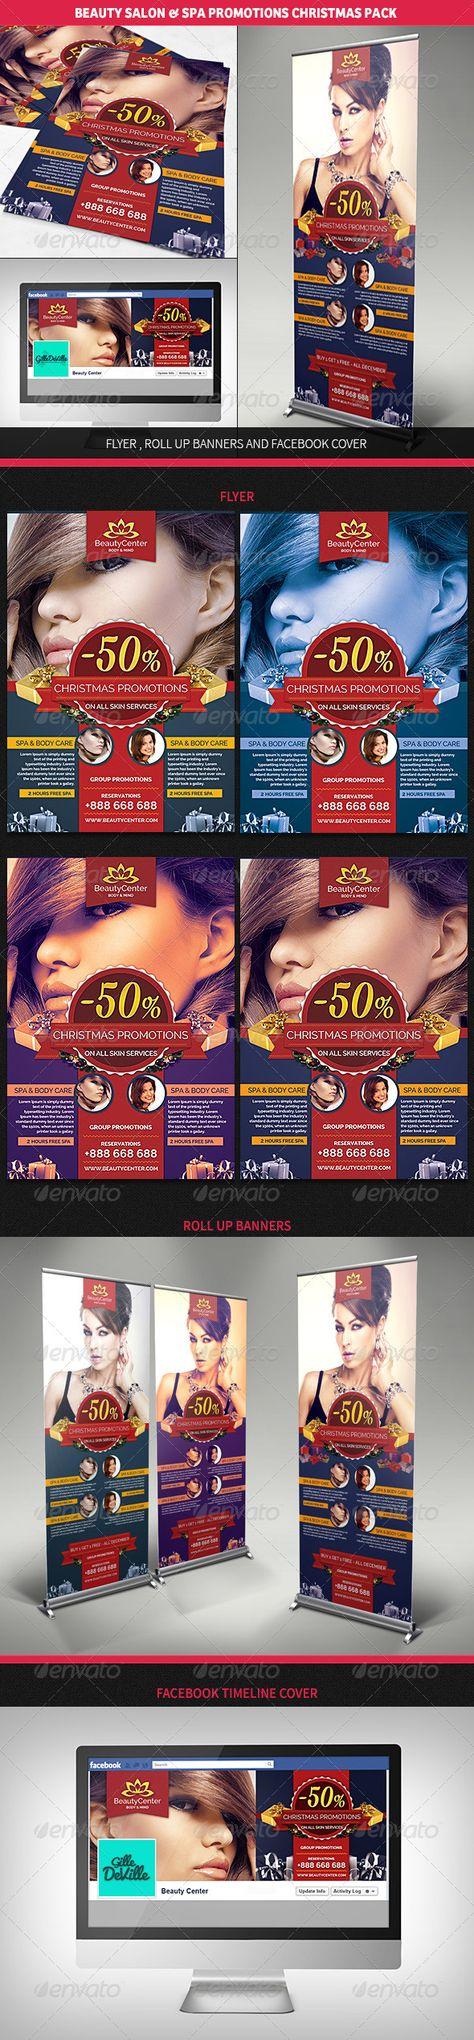 Fashion and Salon facebook cover deign Download